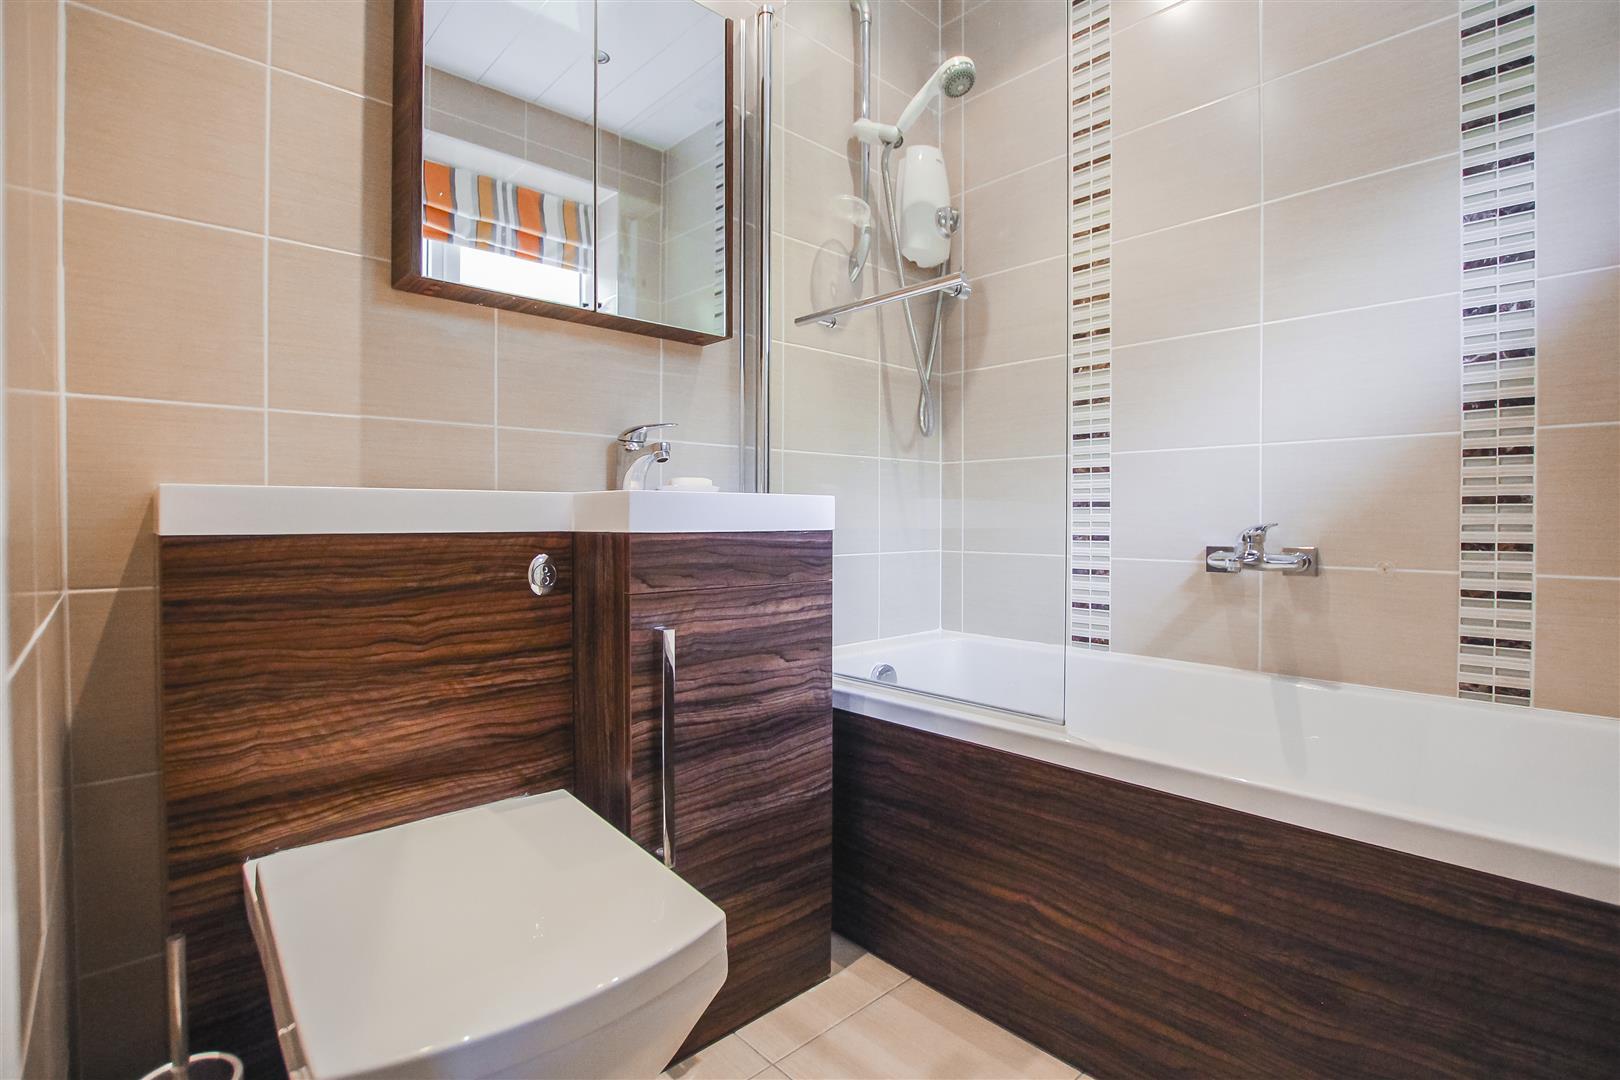 6 Bedroom Detached House For Sale - Bedroom Four En-suite